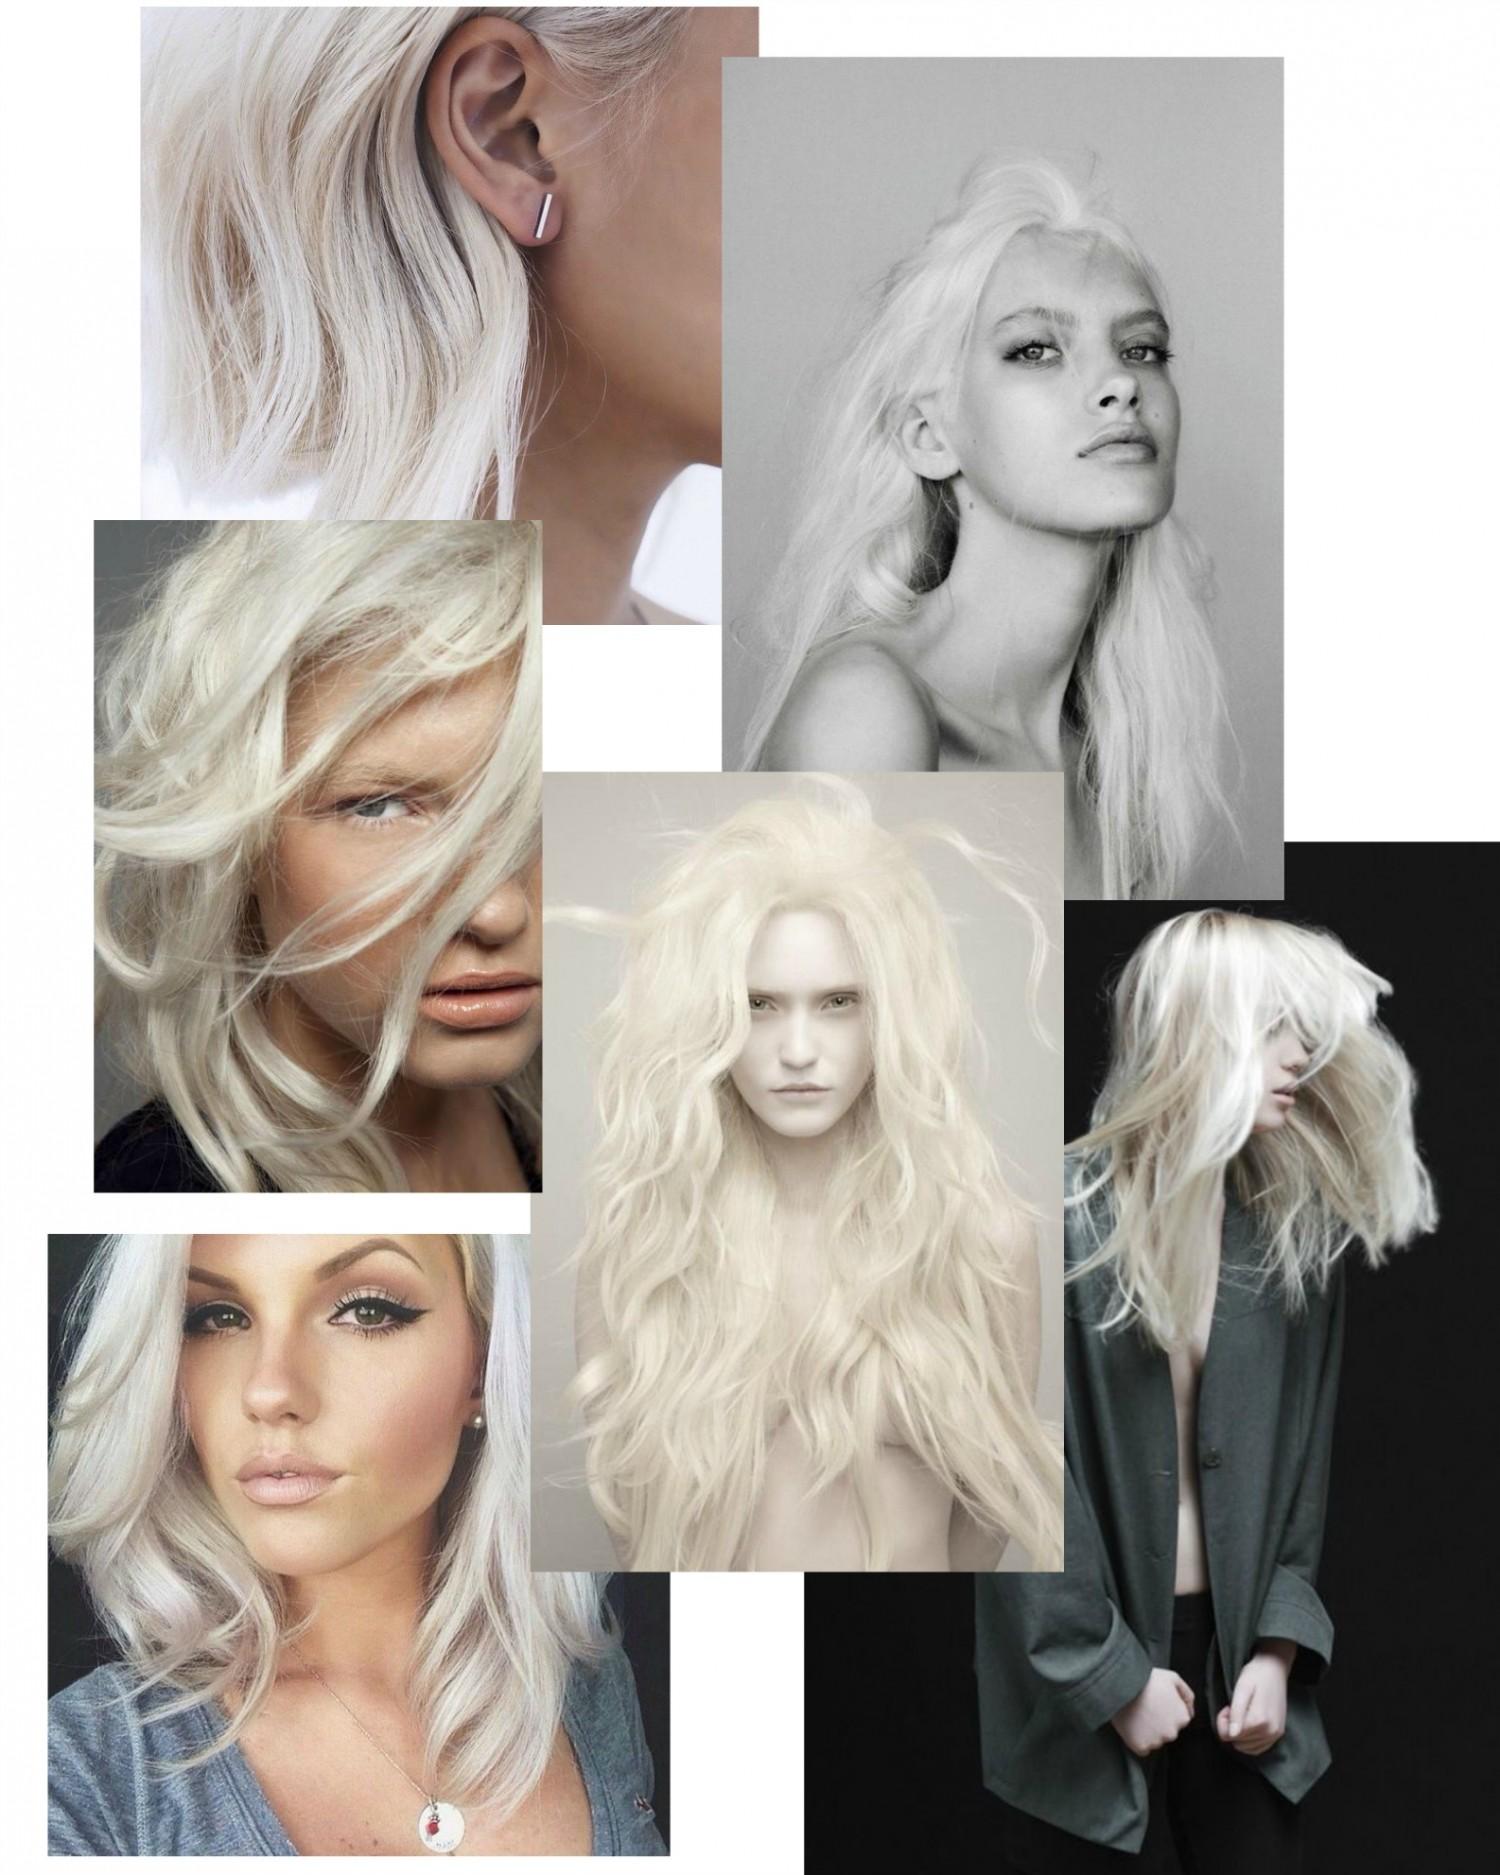 blondethoughts